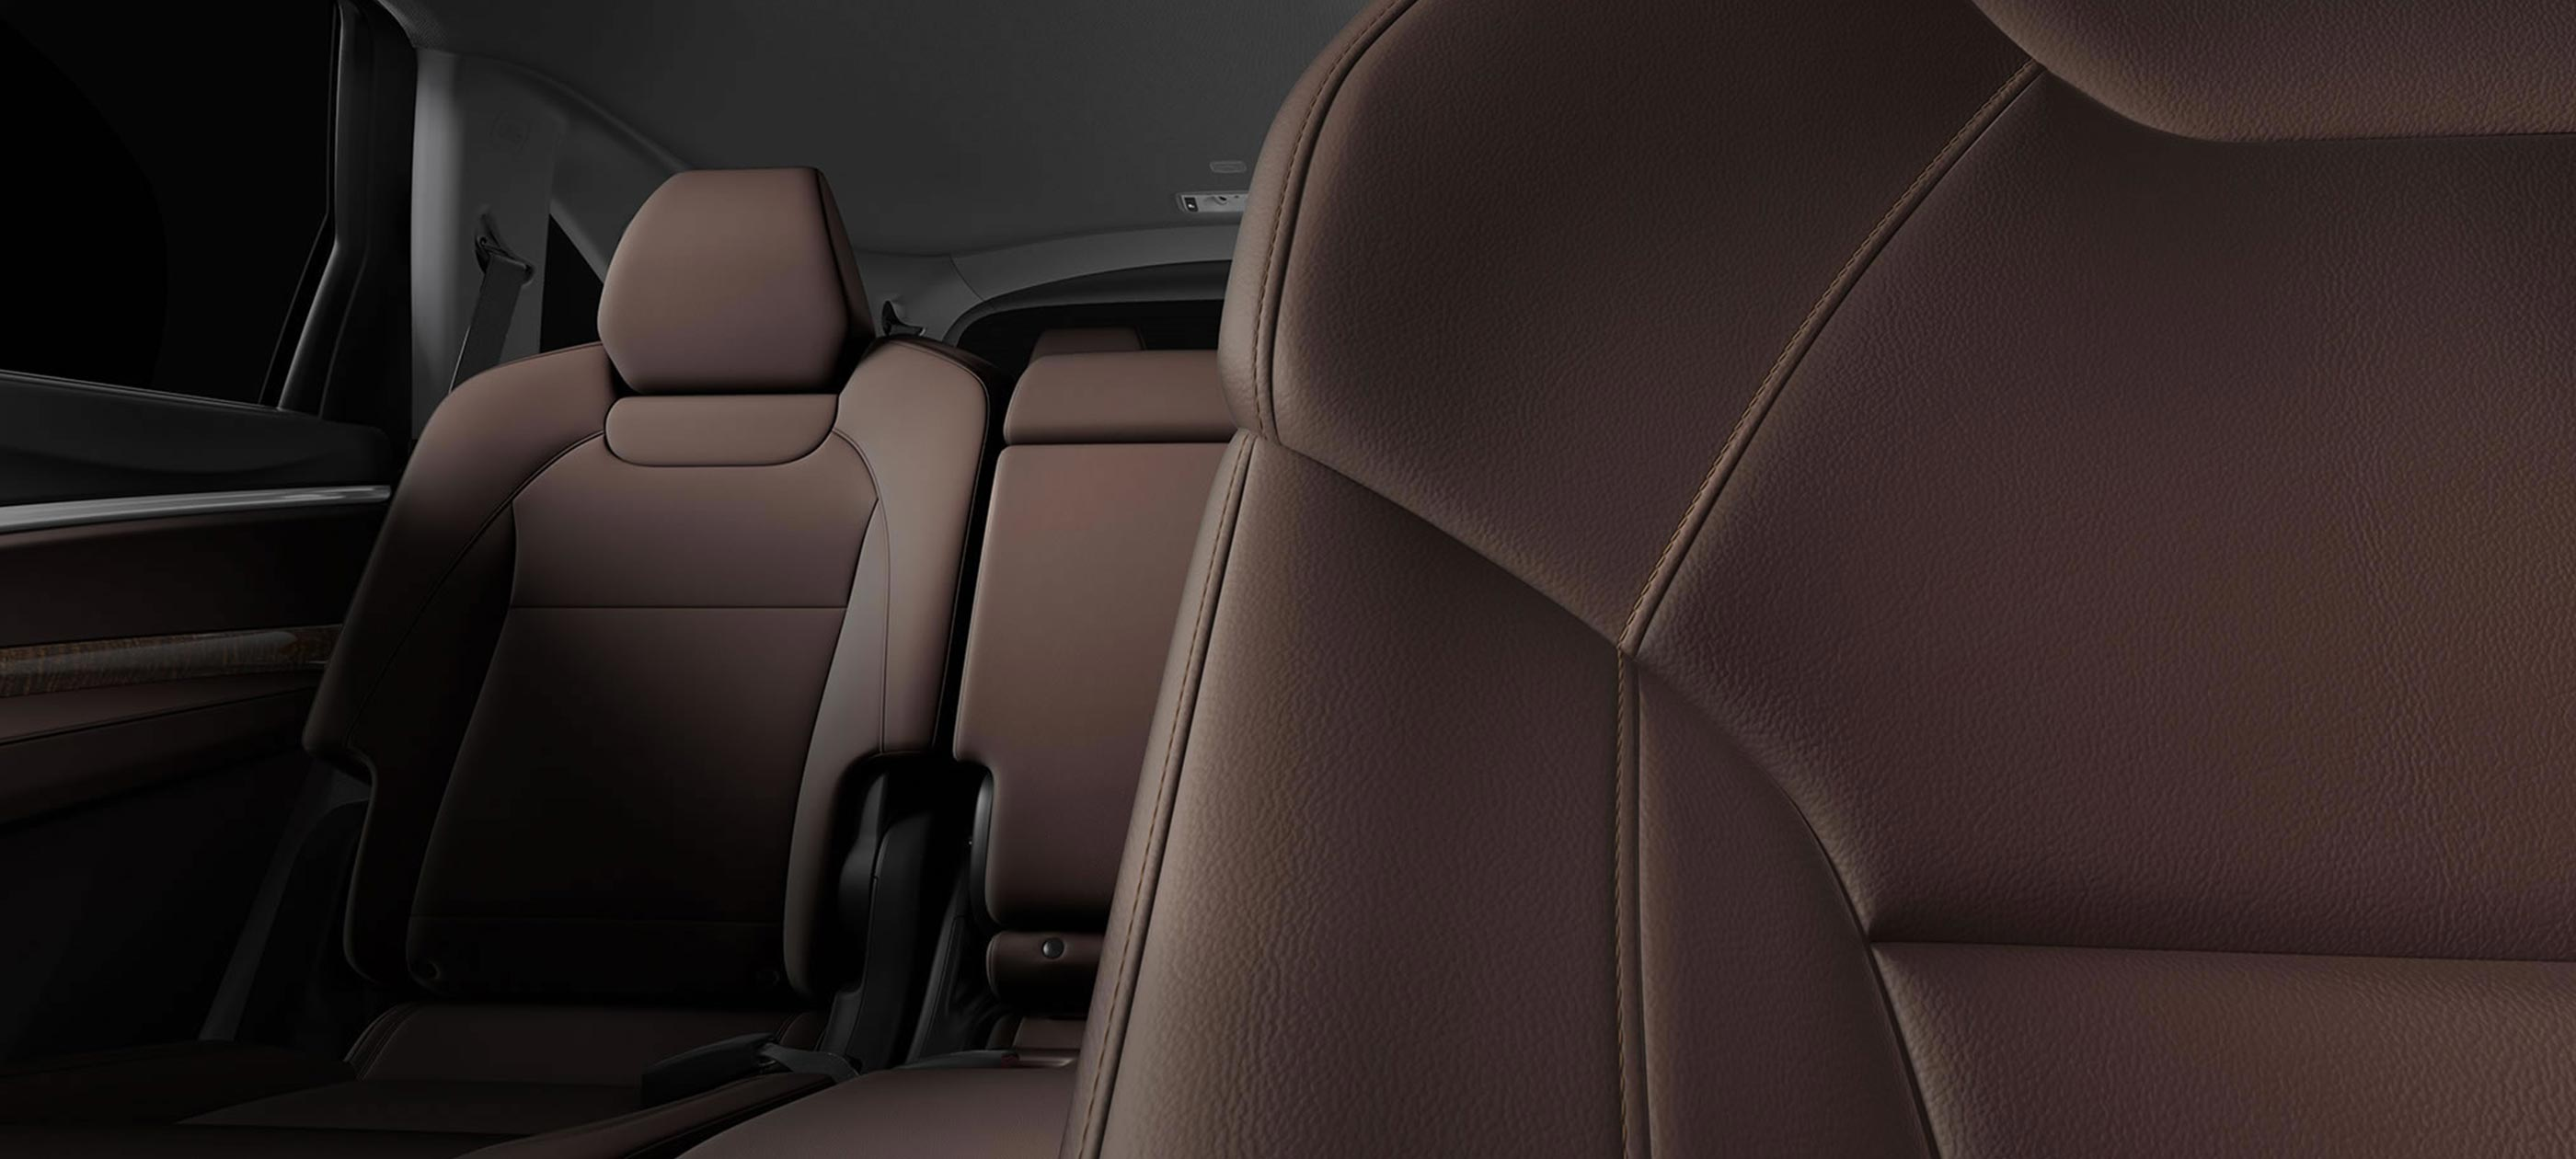 Distinctive Leather Seats